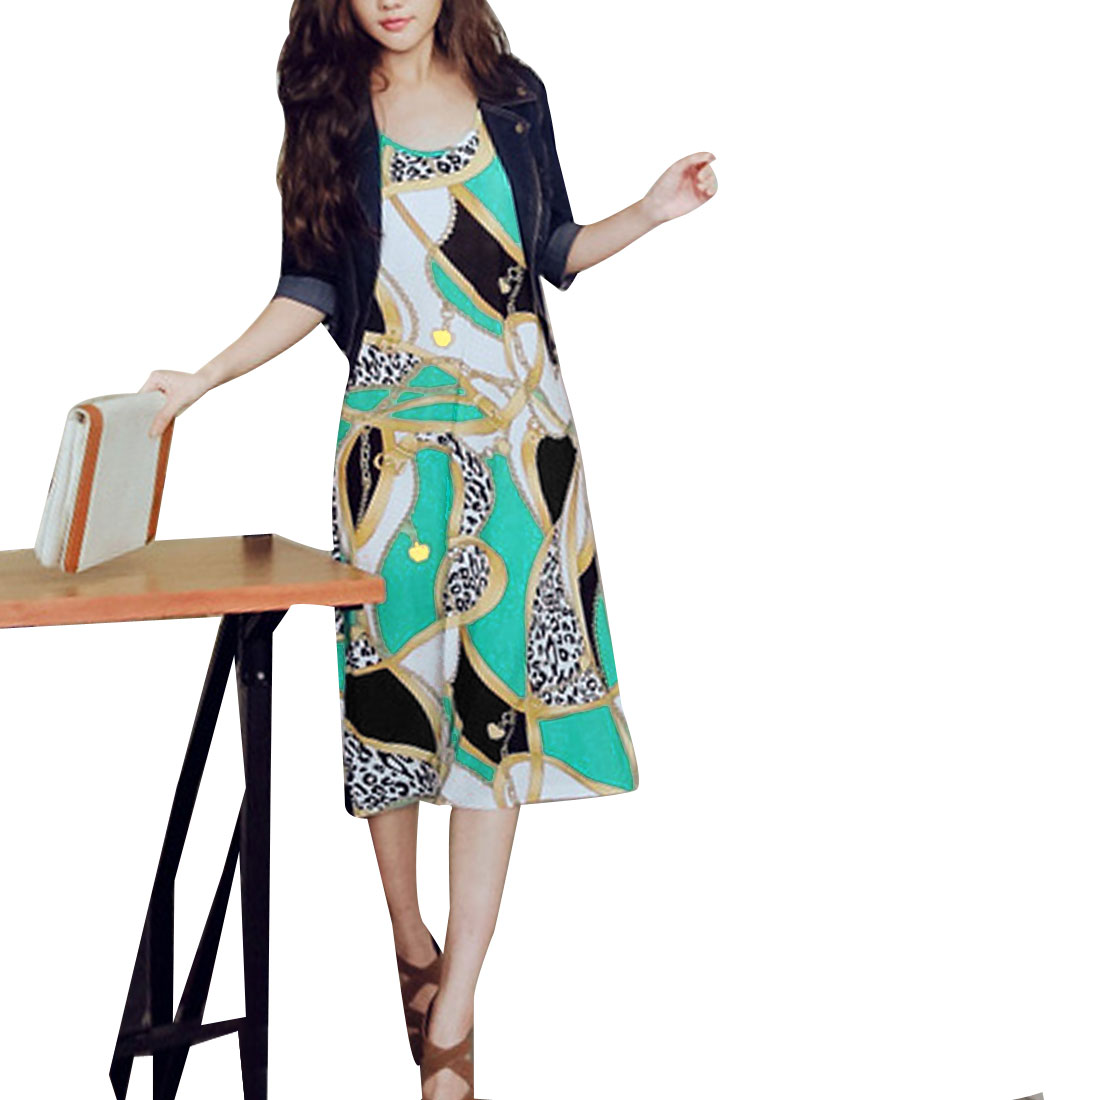 Women Sleeveless Style Round Neck Round Hem Casual Dress Multicolor Xs